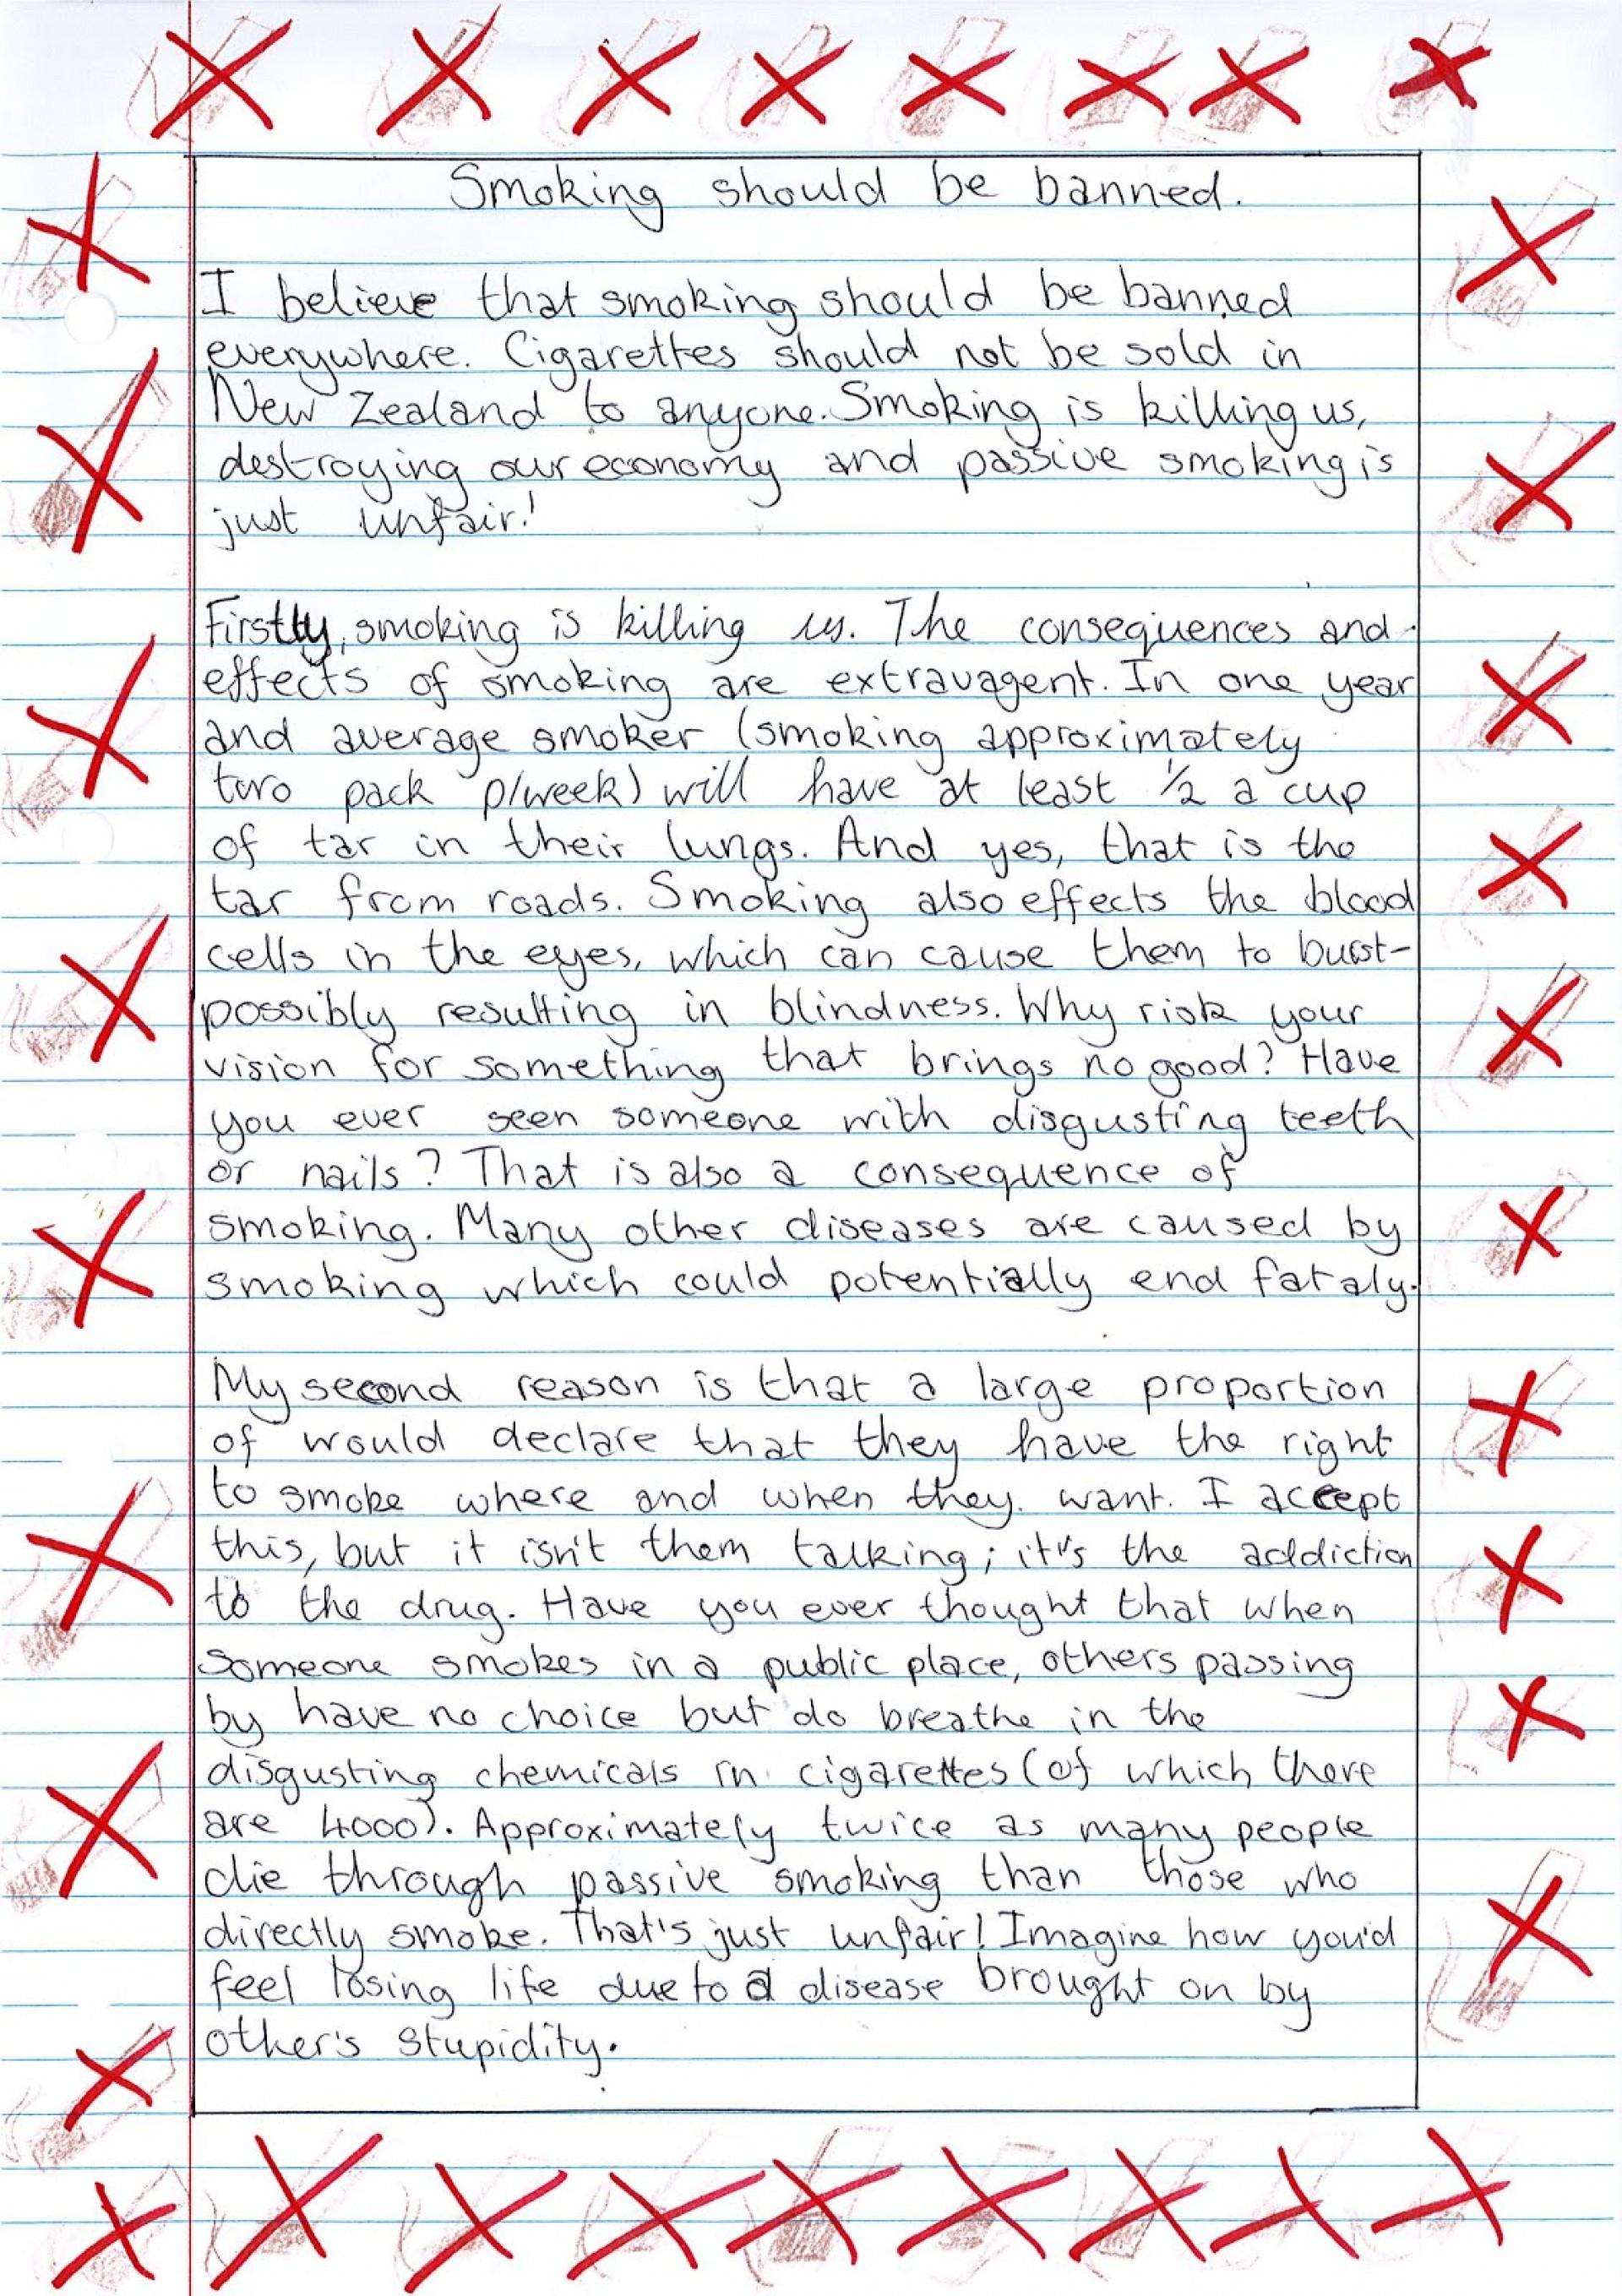 002 Examination Should Abolished Essay Example Smoklng1 Surprising Be Public At School Level Not 1920